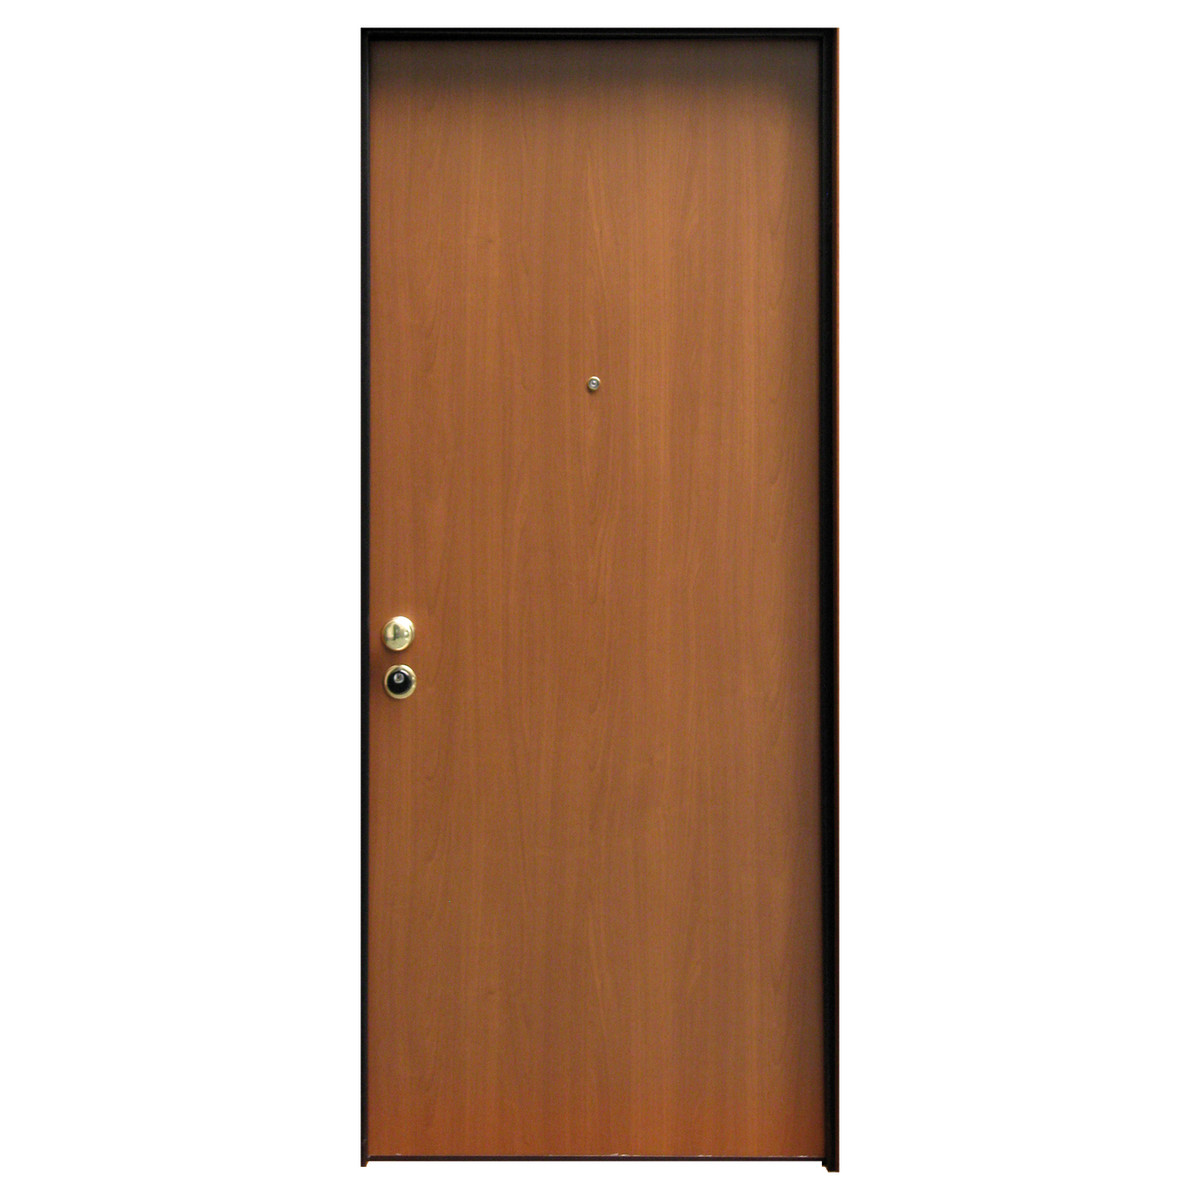 Porta blindata hook tanganika medio l 90 x h 210 cm dx - Pannello porta blindata leroy merlin ...